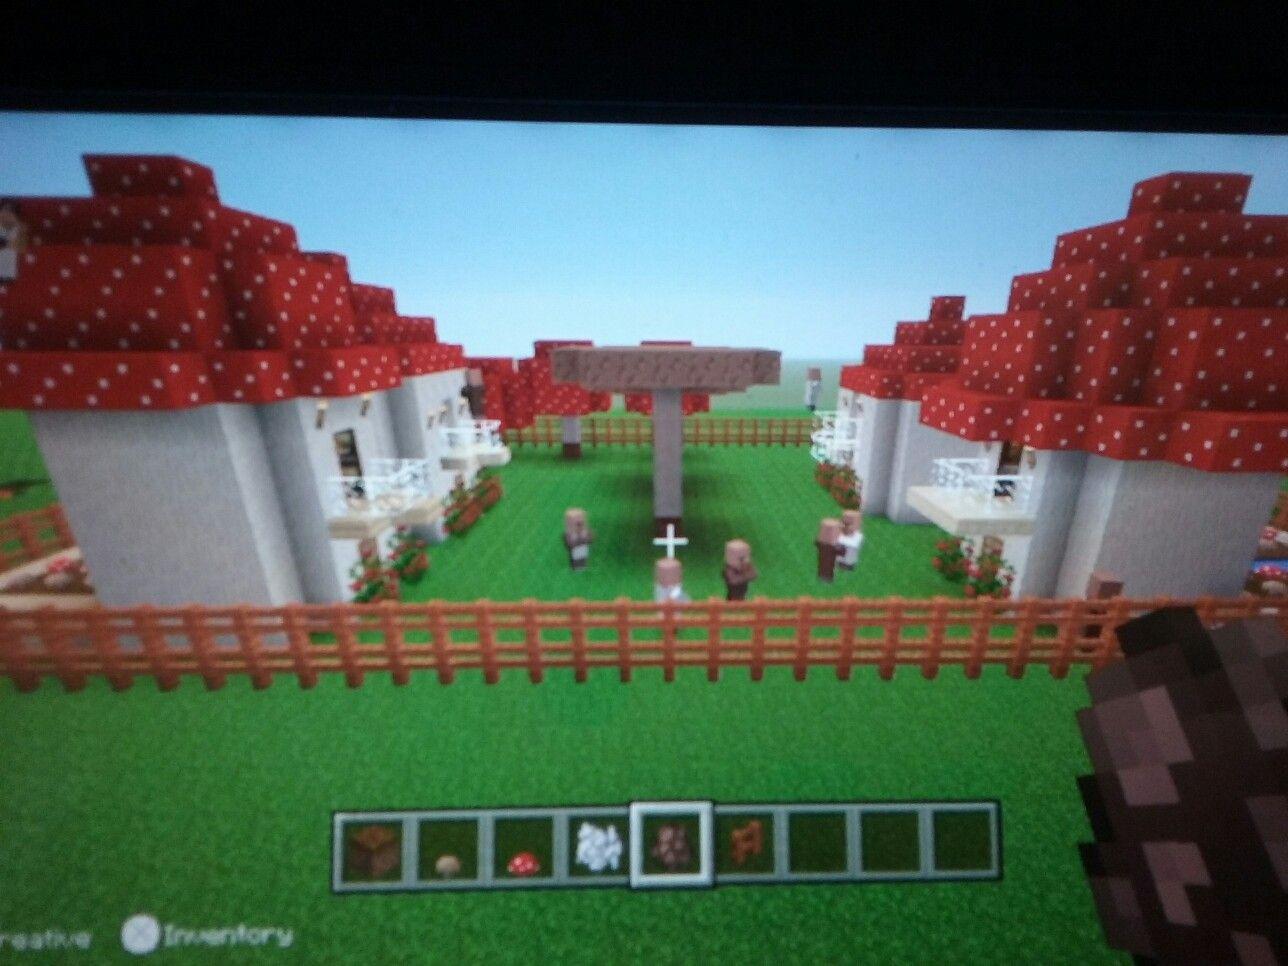 So much fun designing a little mushroom village for villagers!